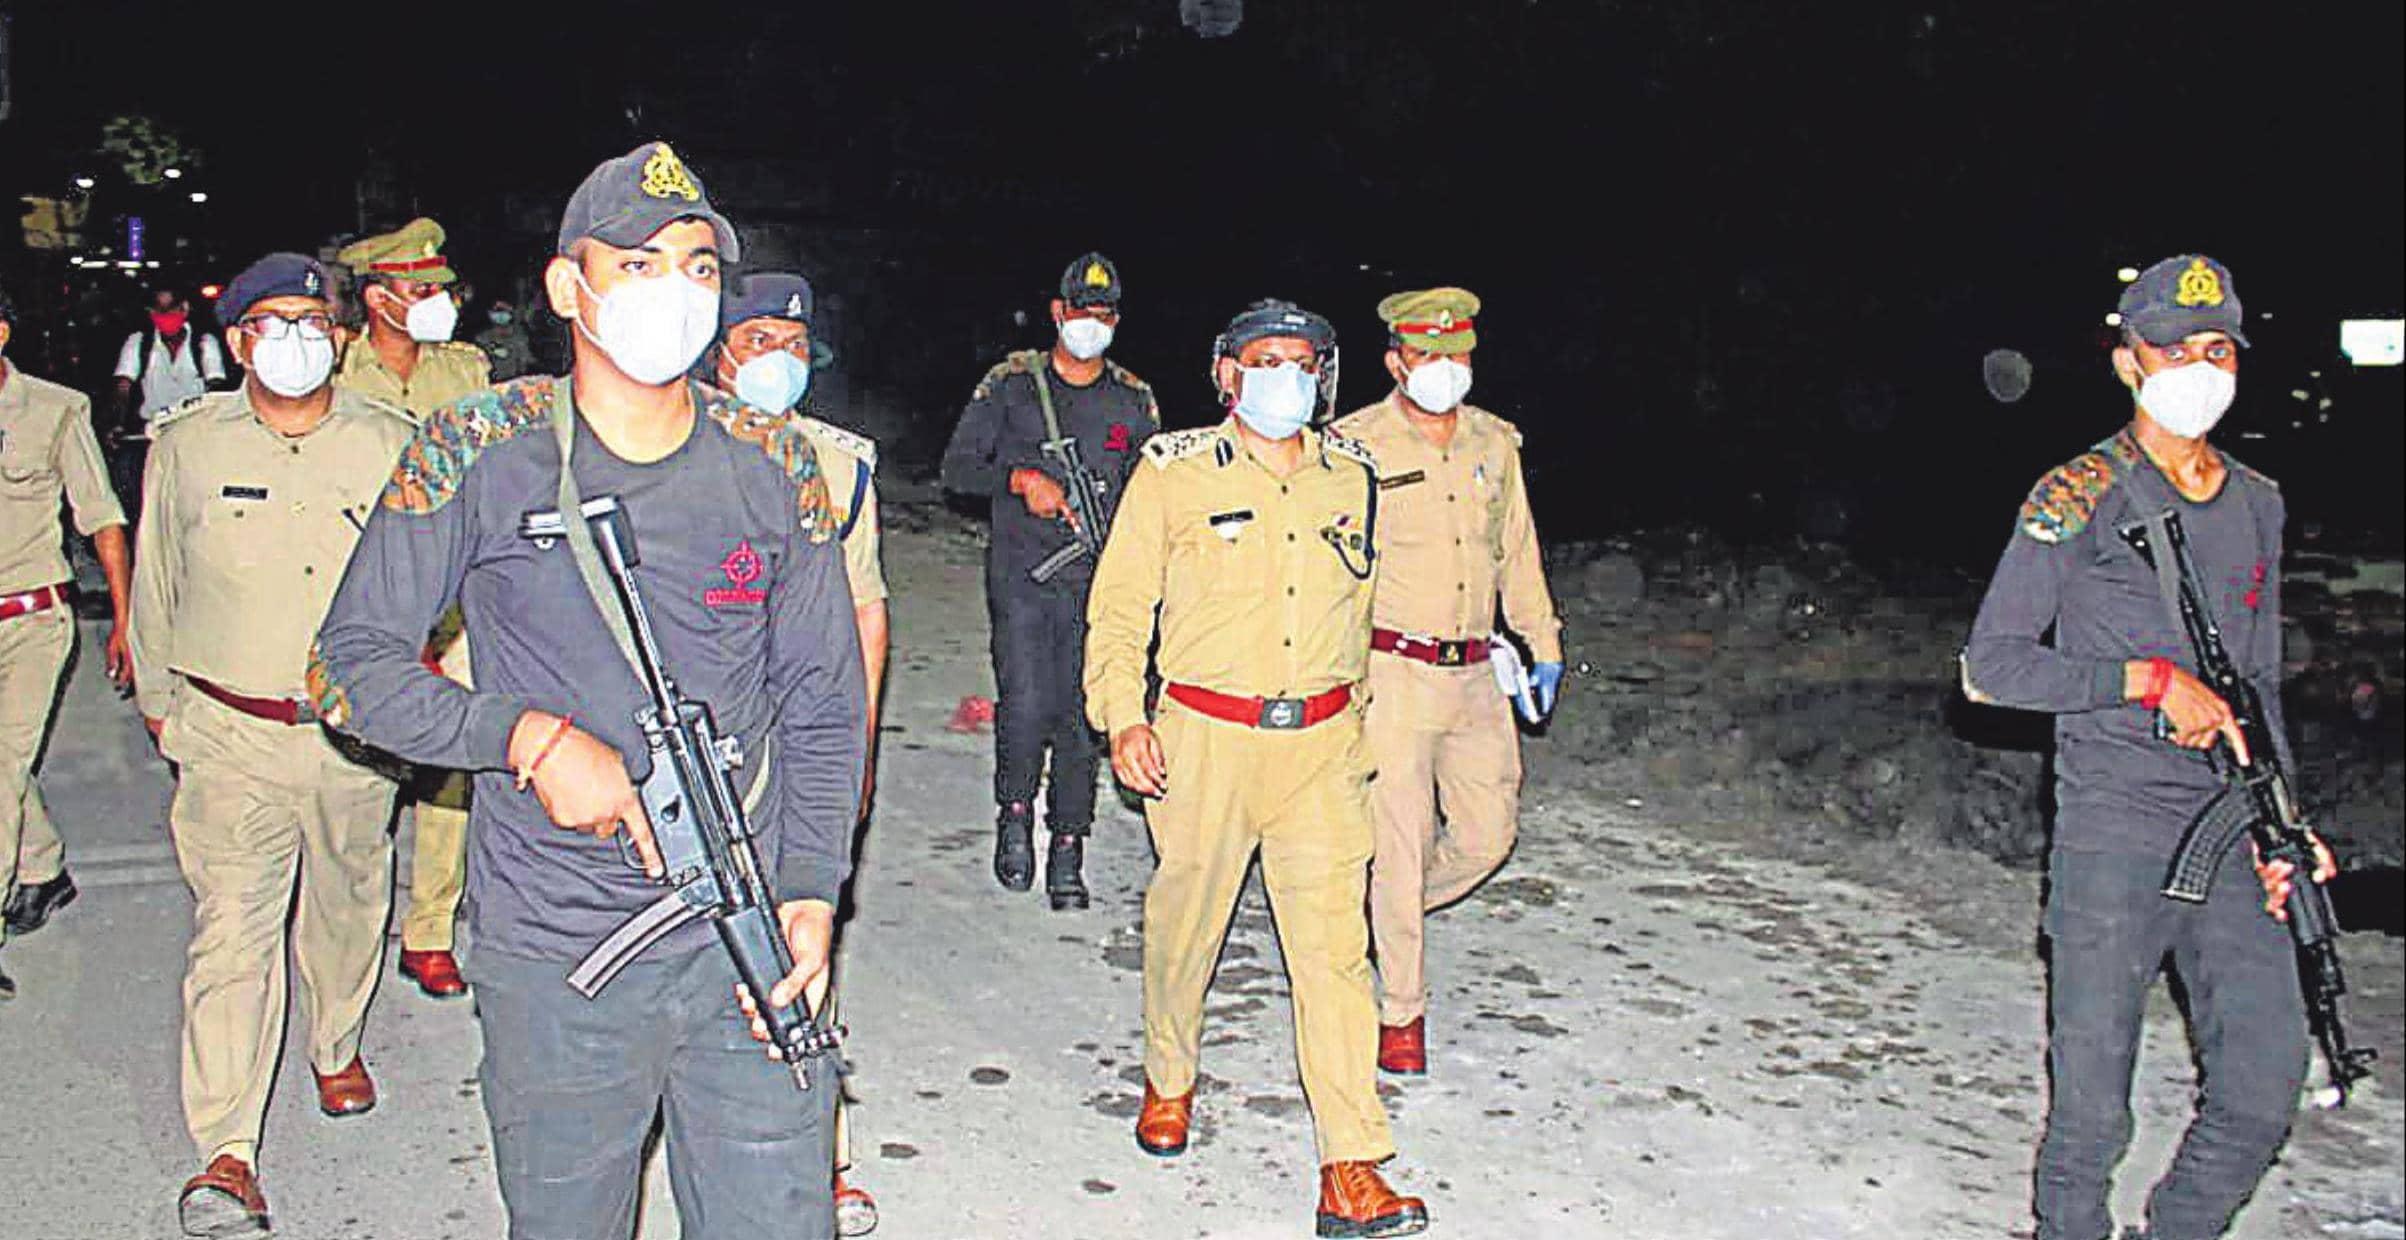 सुरक्षा: एसपीजी ने अयोध्या की कमान संभाली